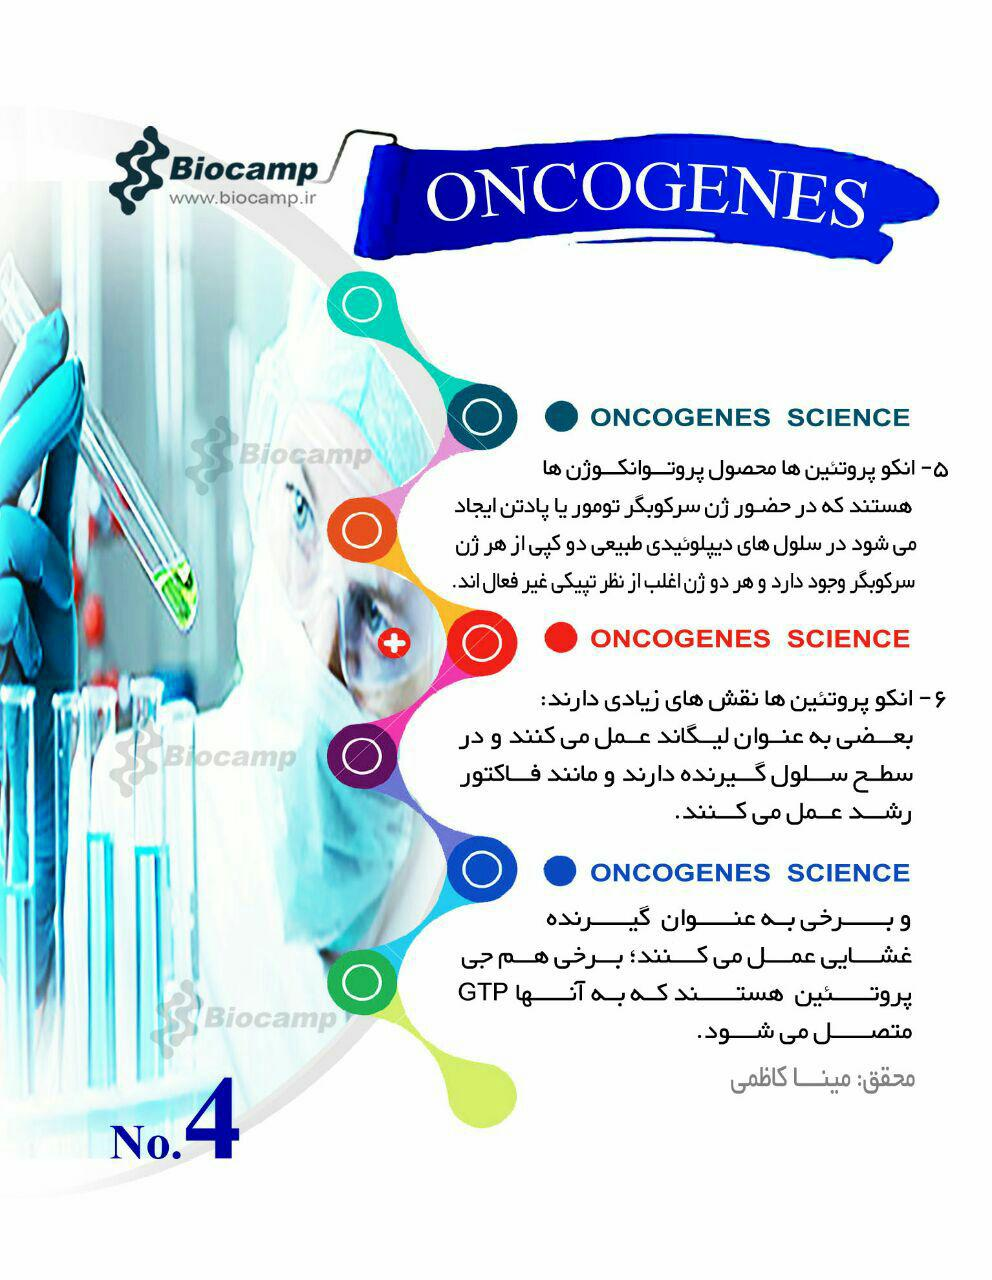 انکوژن انکوژن چیست؟ اینفوگرافی انکوژن چیست؟ اینفوگرافی photo 2016 09 12 21 16 14